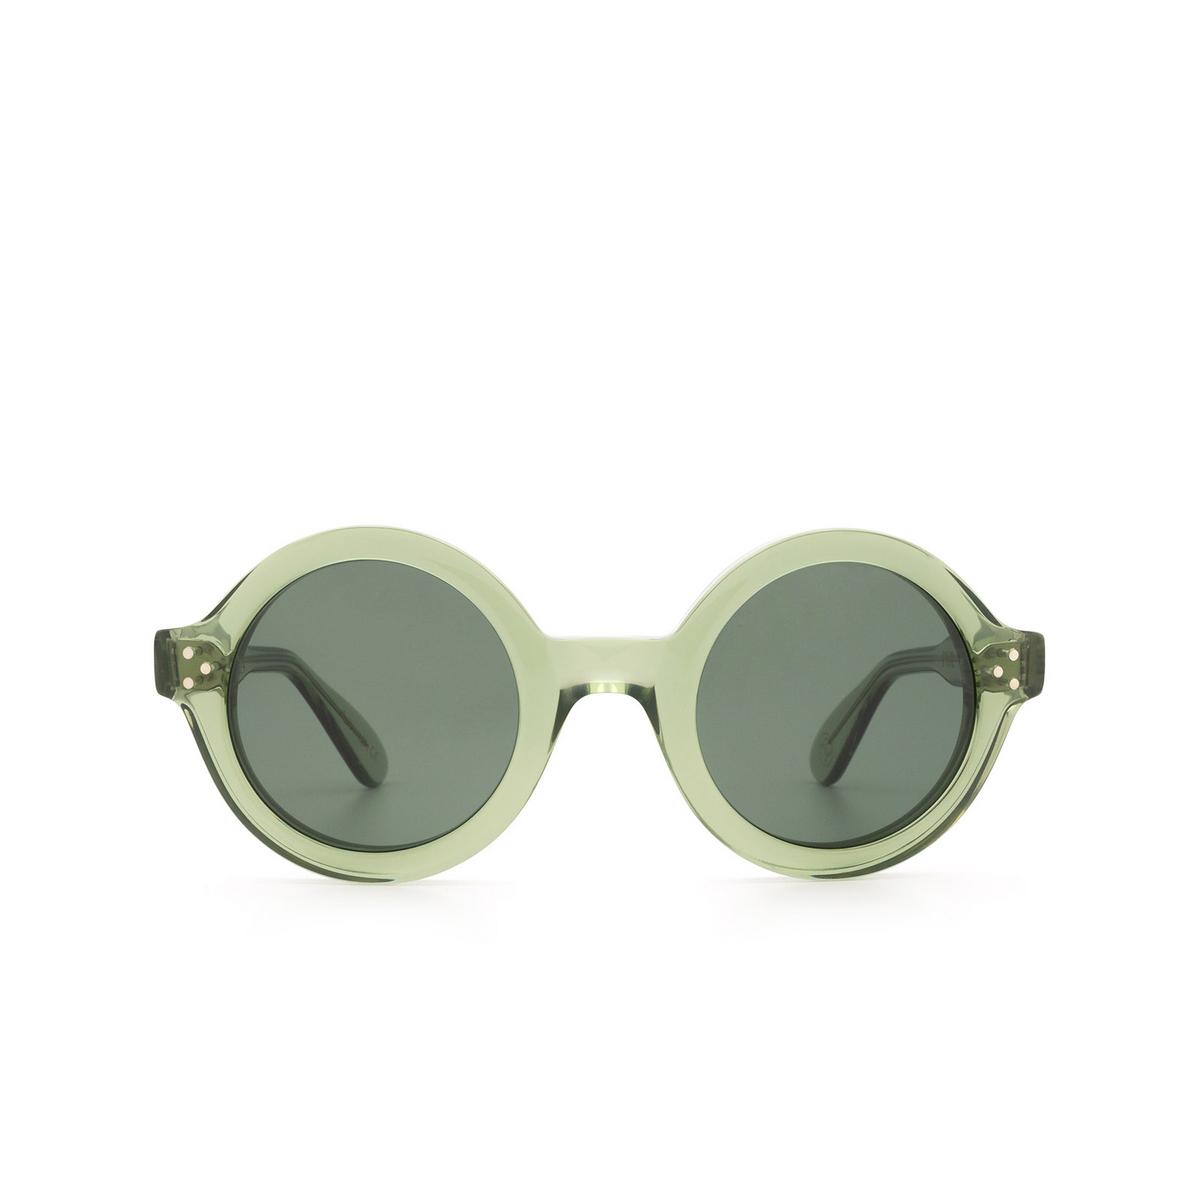 Lesca® Round Sunglasses: Phil Sun color Green 2 A9 - front view.